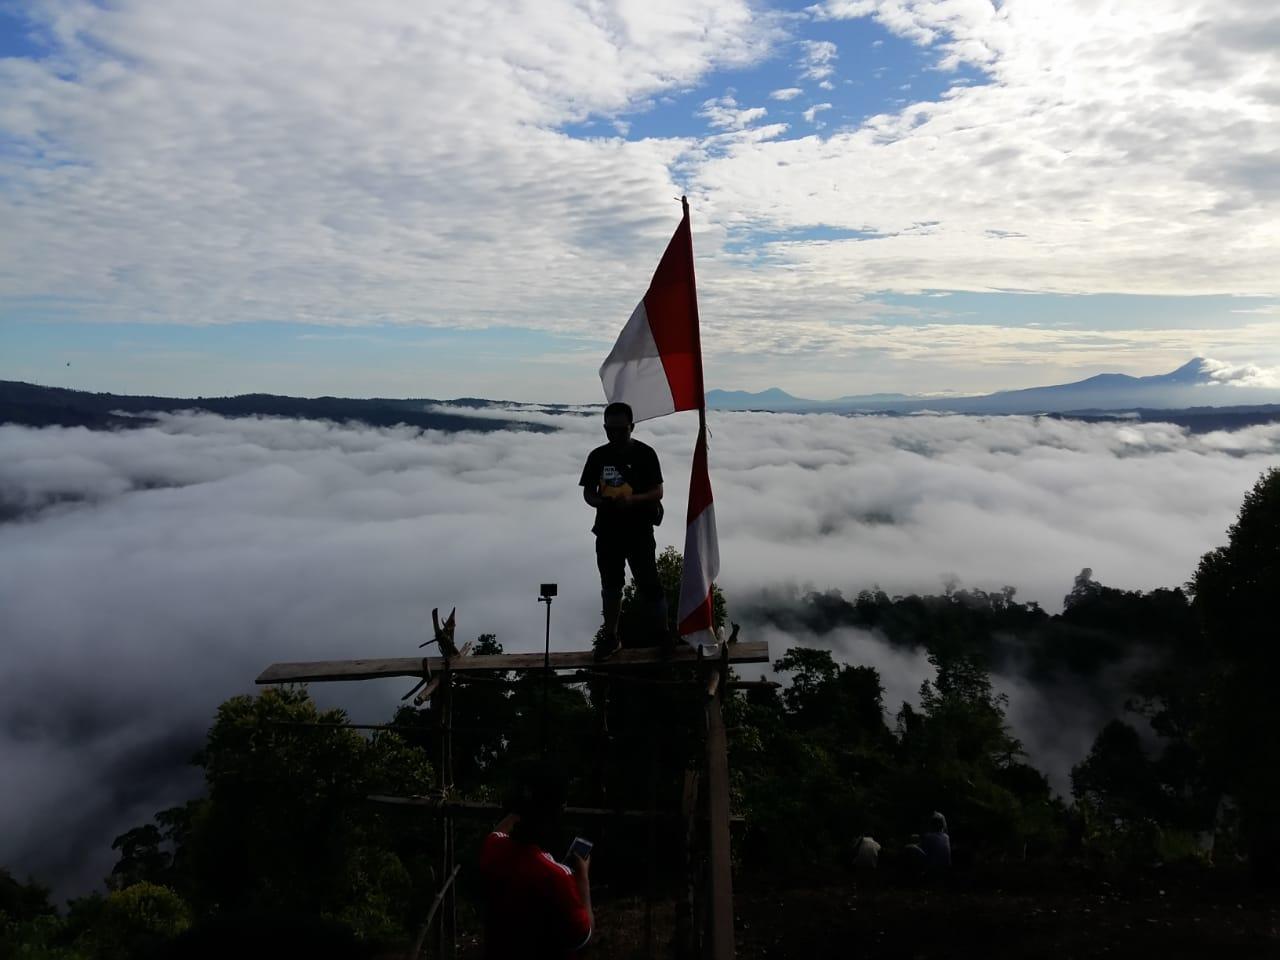 https: img-k.okeinfo.net content 2018 09 09 406 1948097 eksotisme-negeri-di-atas-awan-desa-poopo-minahasa-selatan-6Od4x2SfhA.jpg